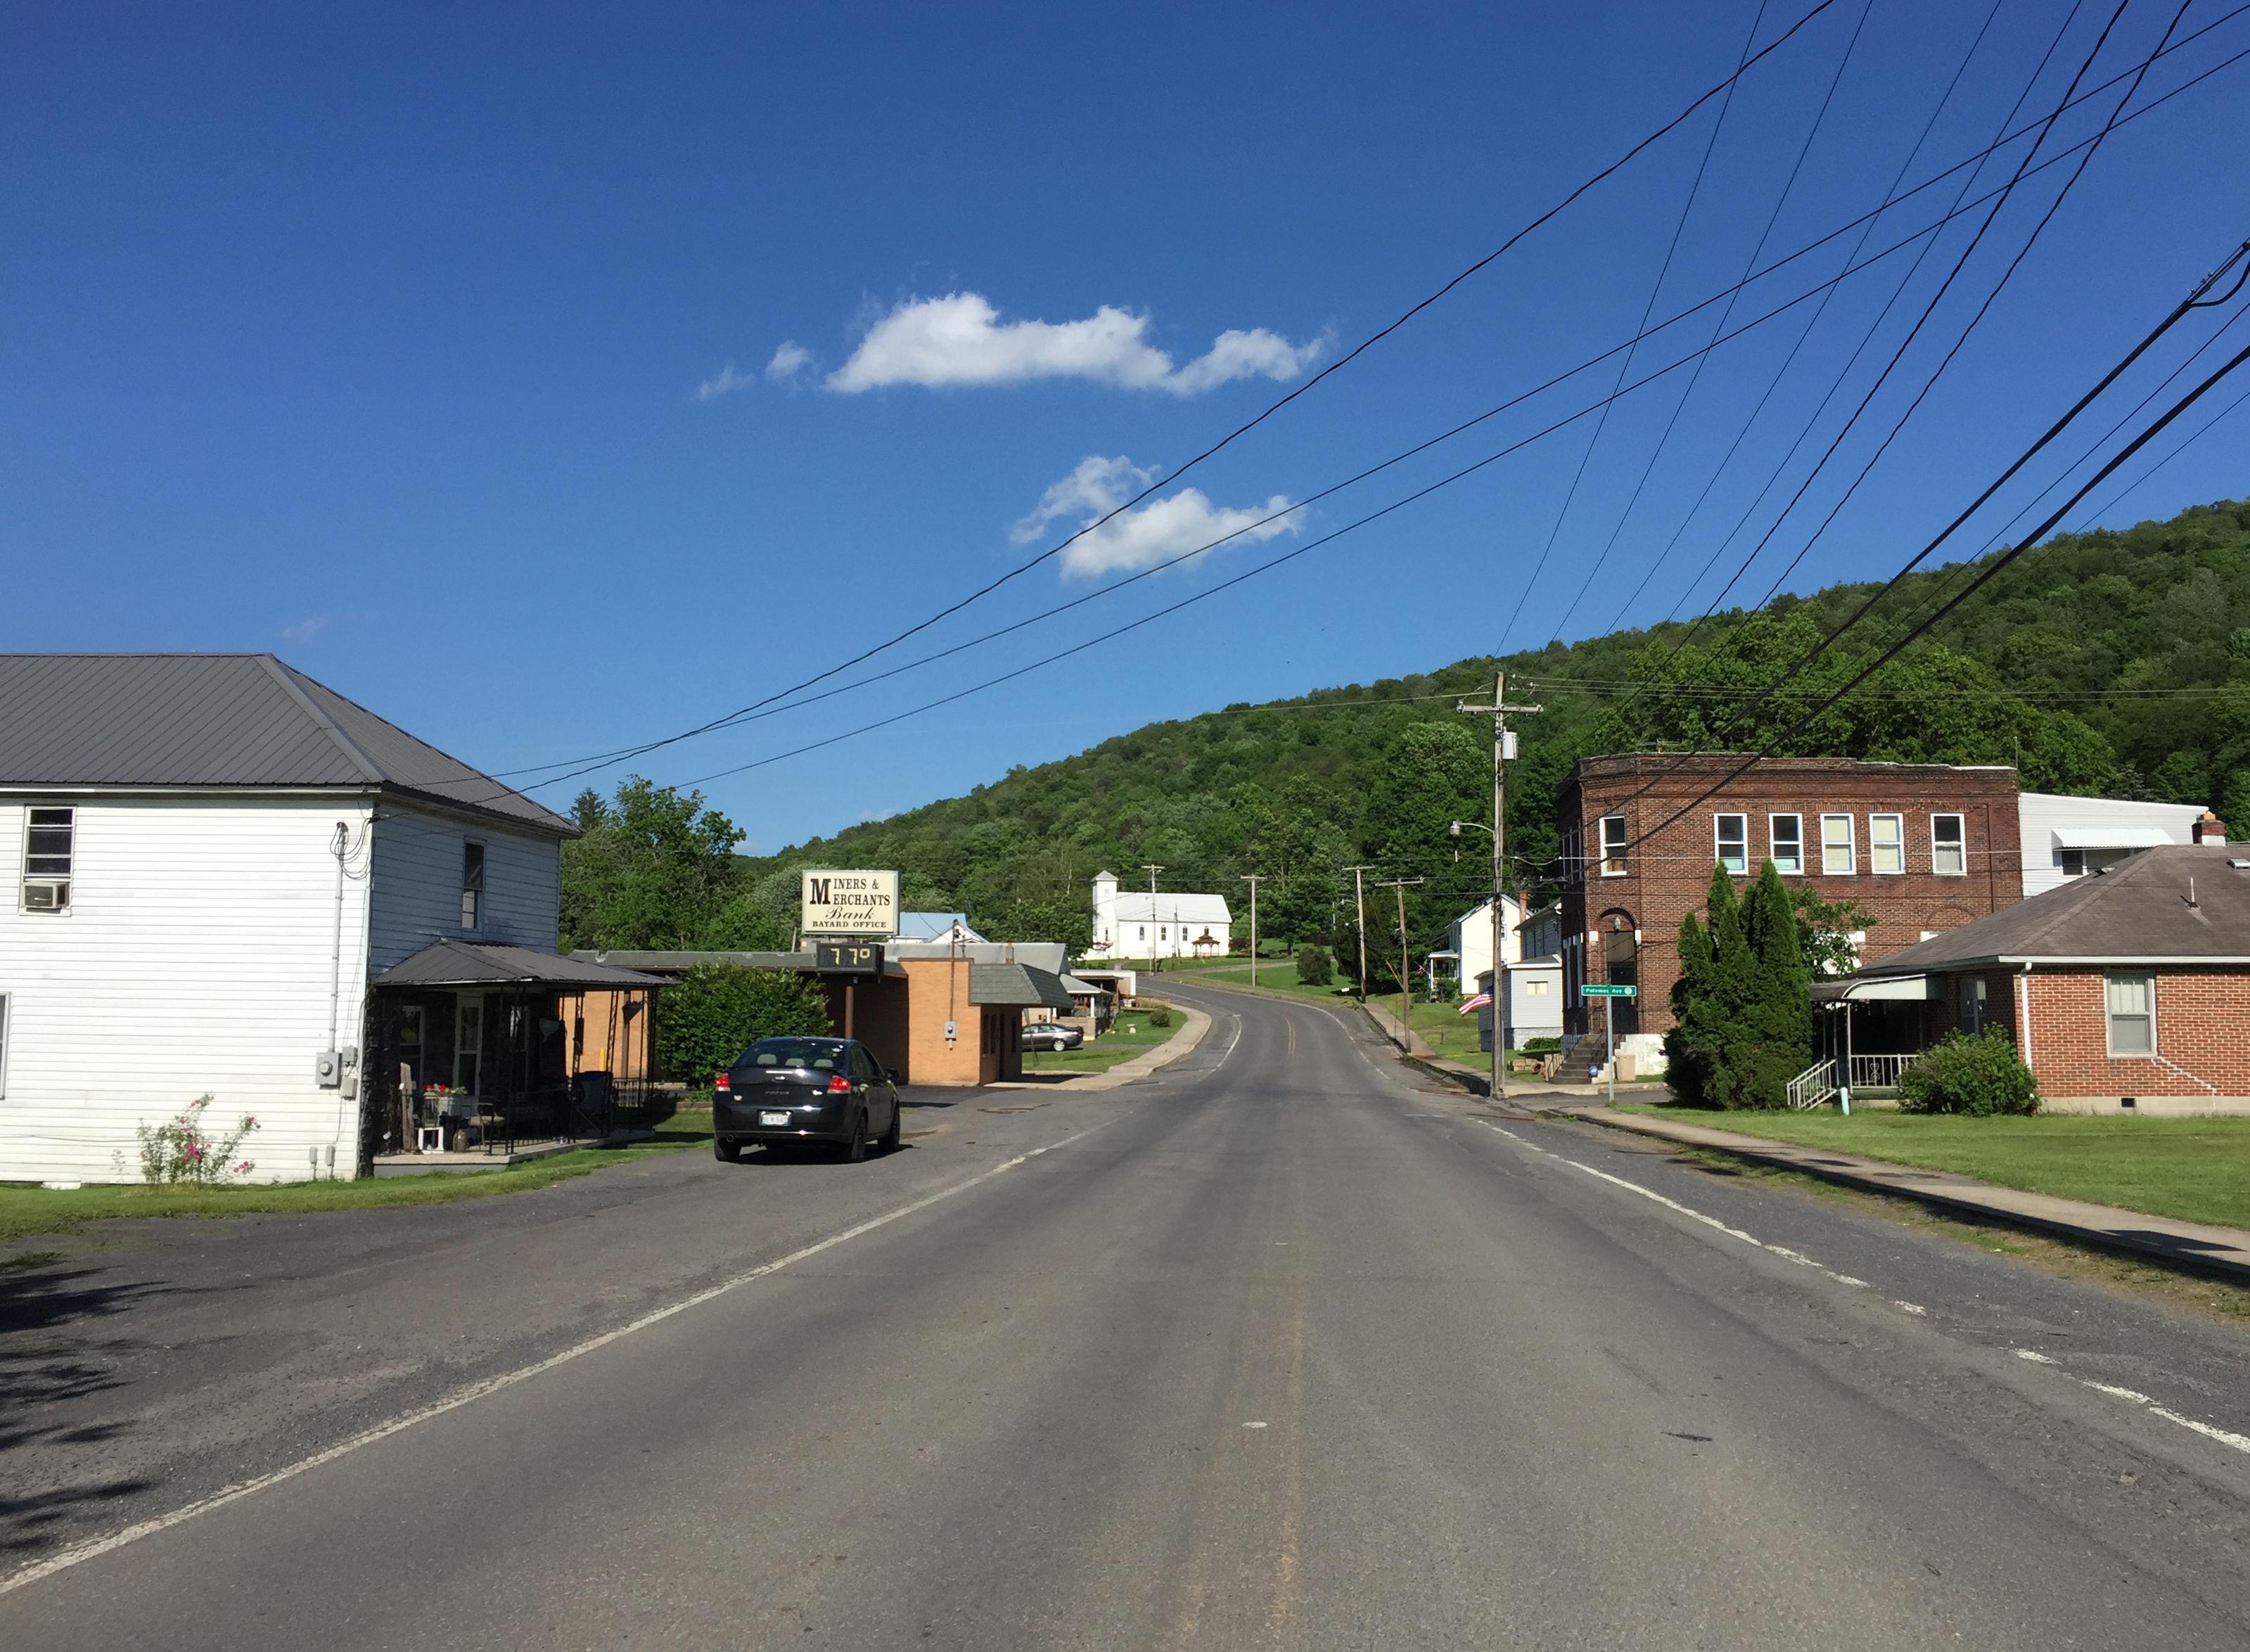 Bayard (Virgínia de l'Oest)